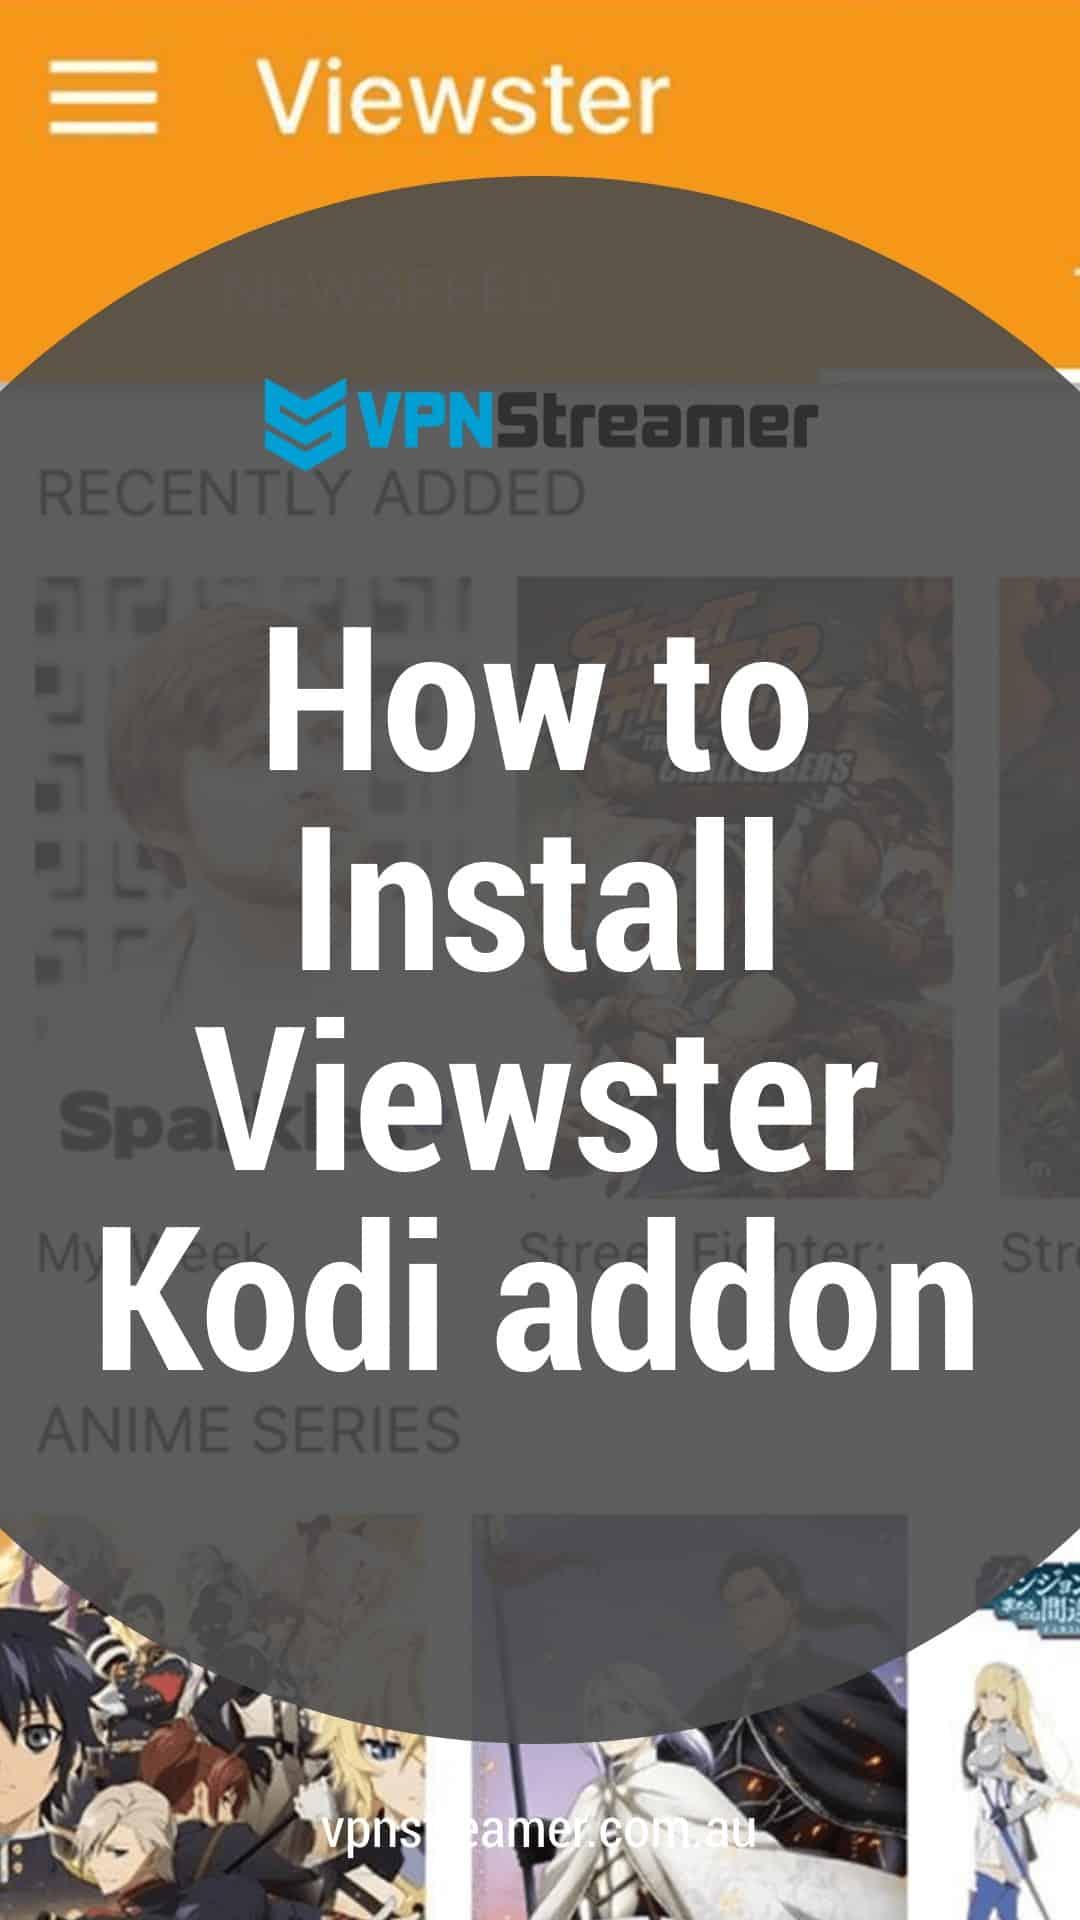 How to Install Viewster Kodi addon